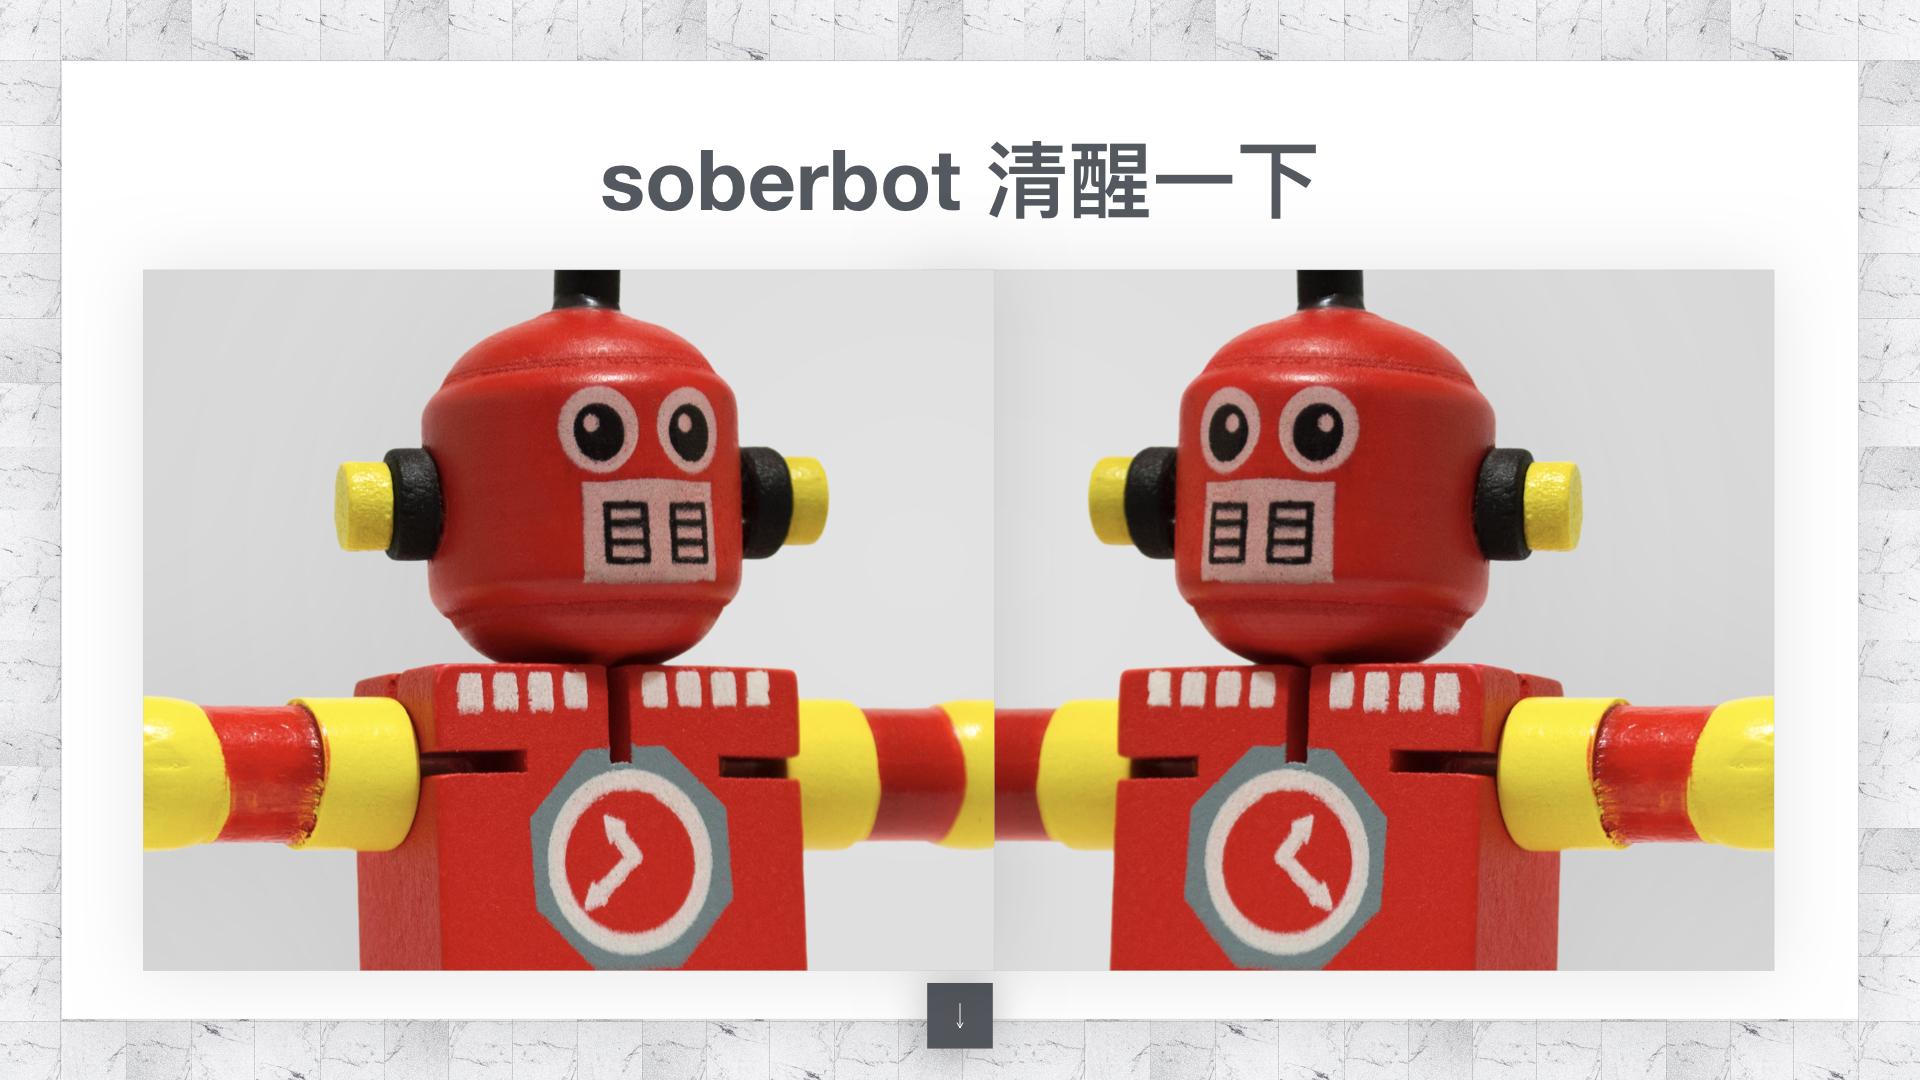 soberbot 006